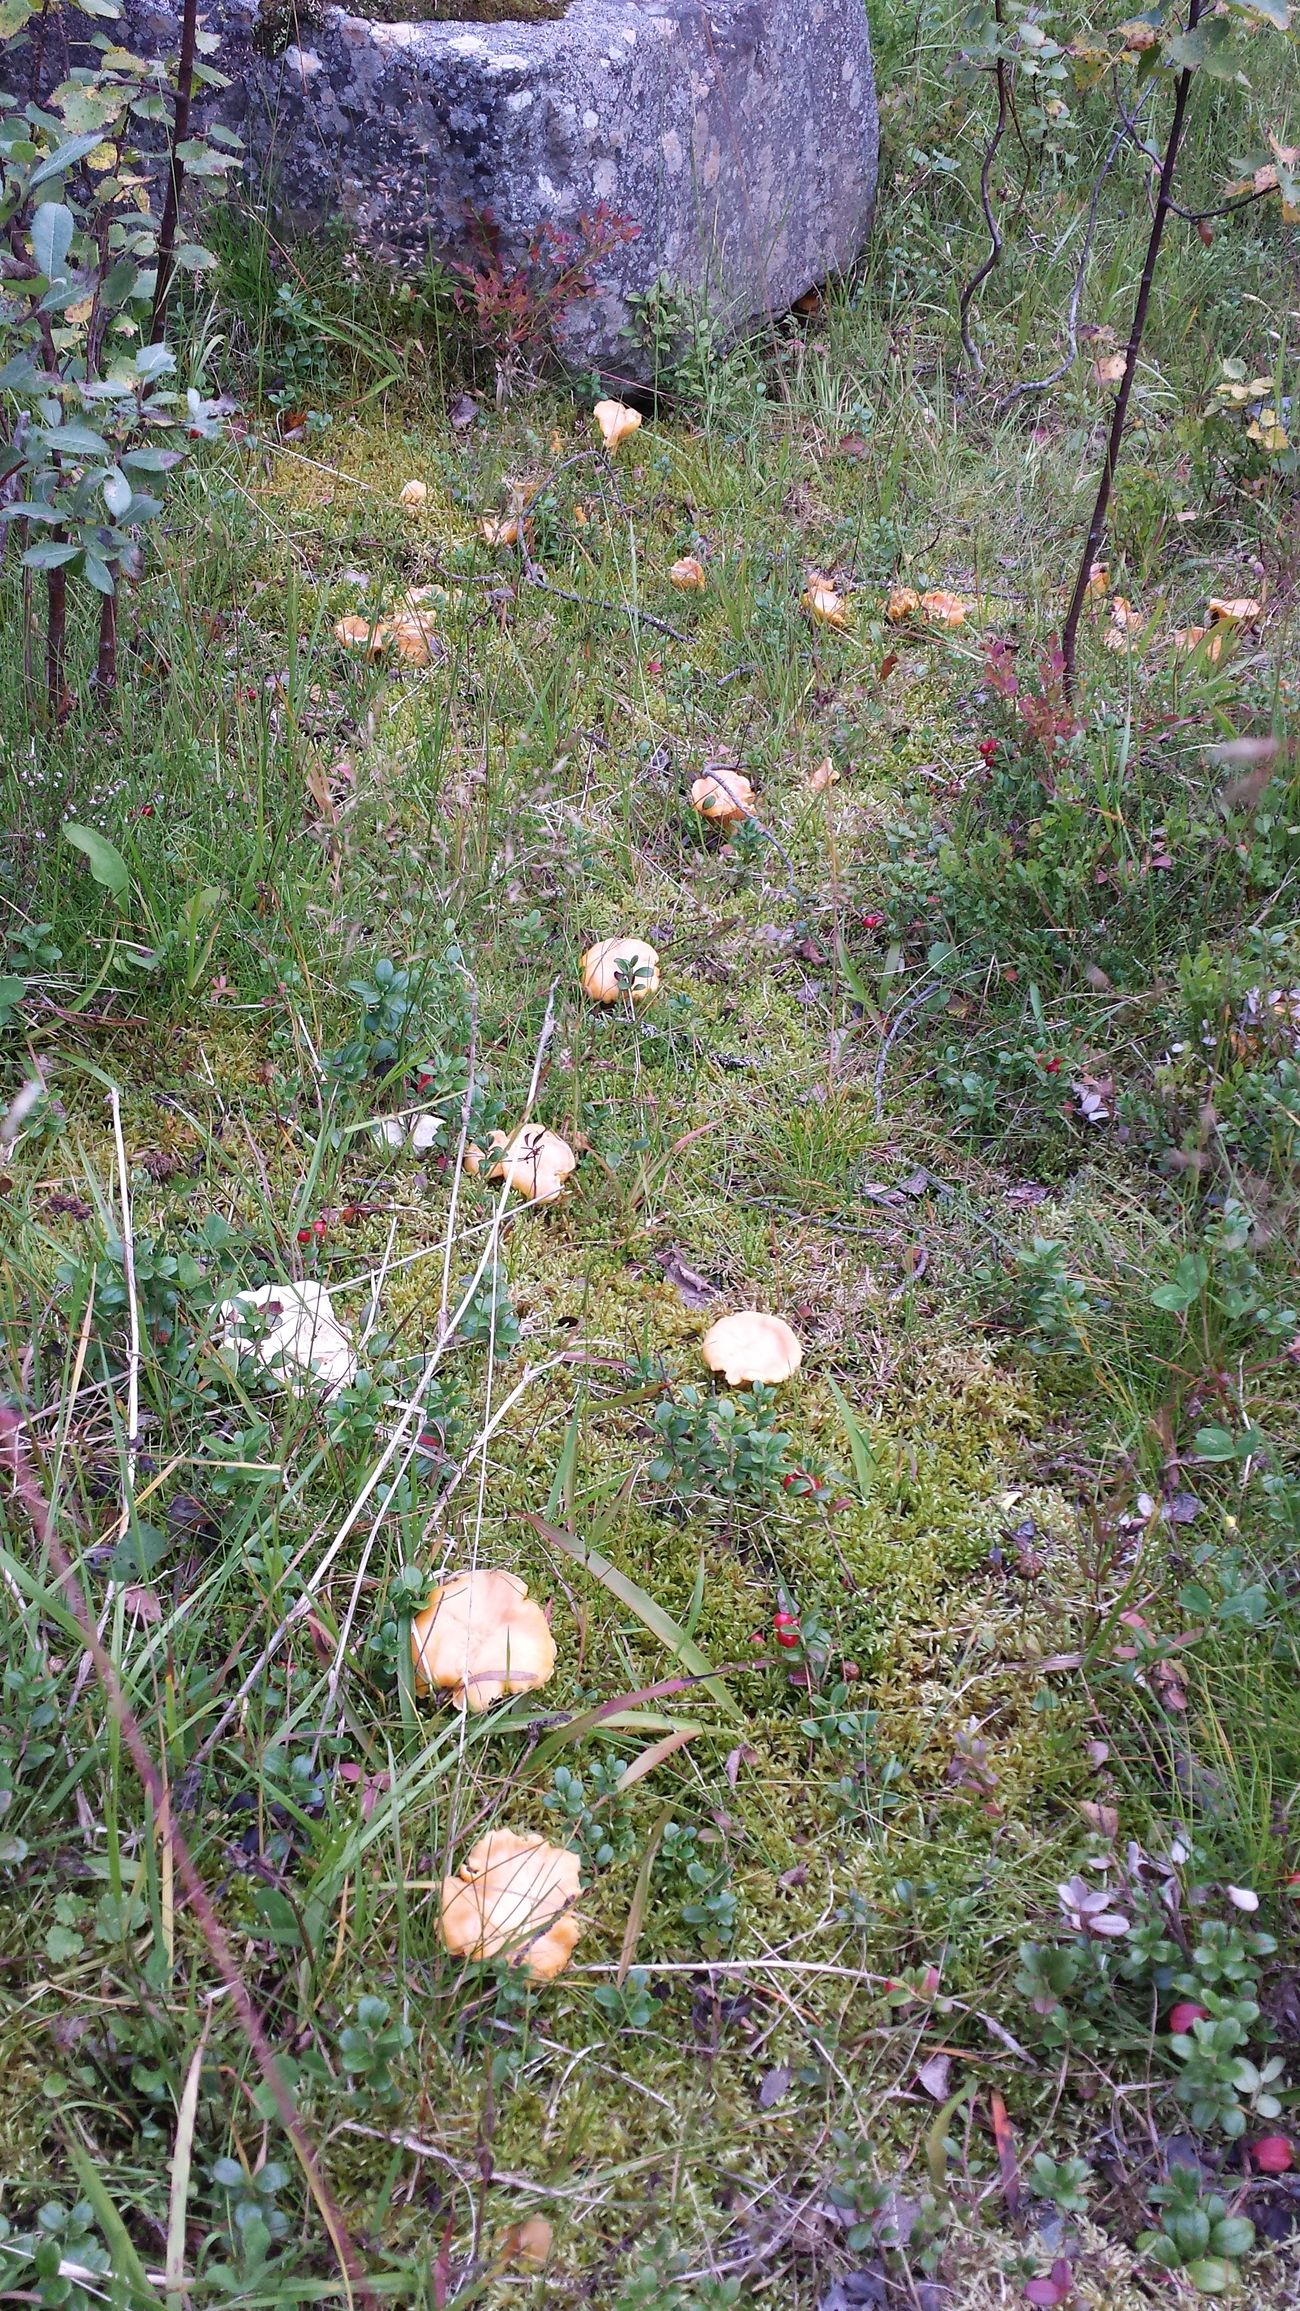 Mushroom Chantarelle Yellow Growing In The Yard